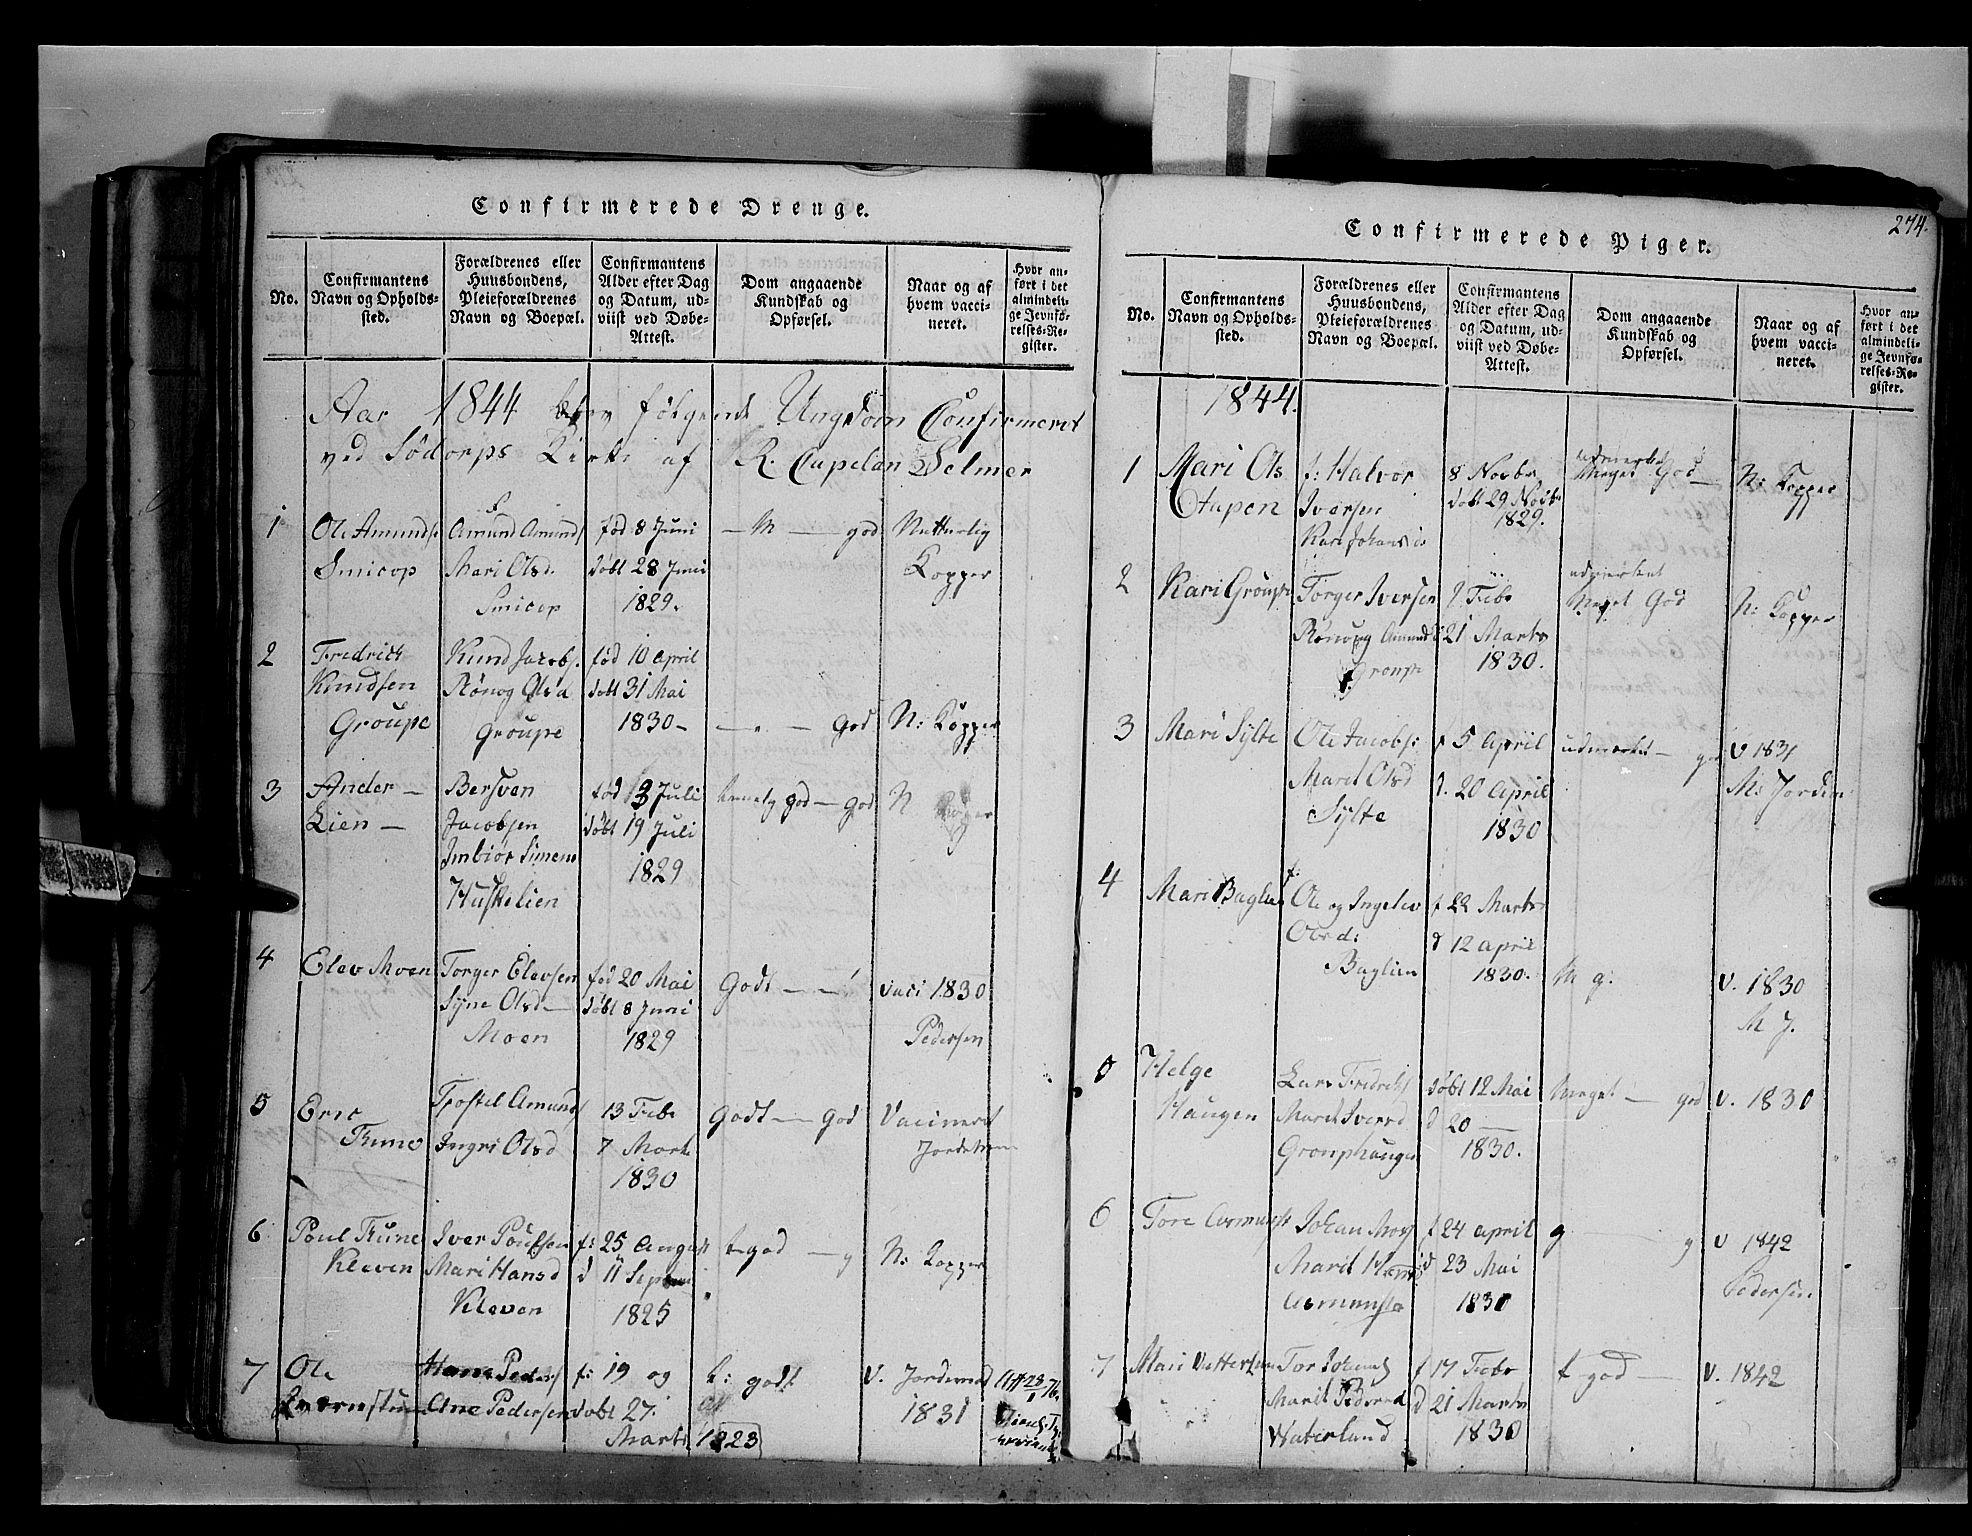 SAH, Fron prestekontor, H/Ha/Hab/L0003: Klokkerbok nr. 3, 1816-1850, s. 274